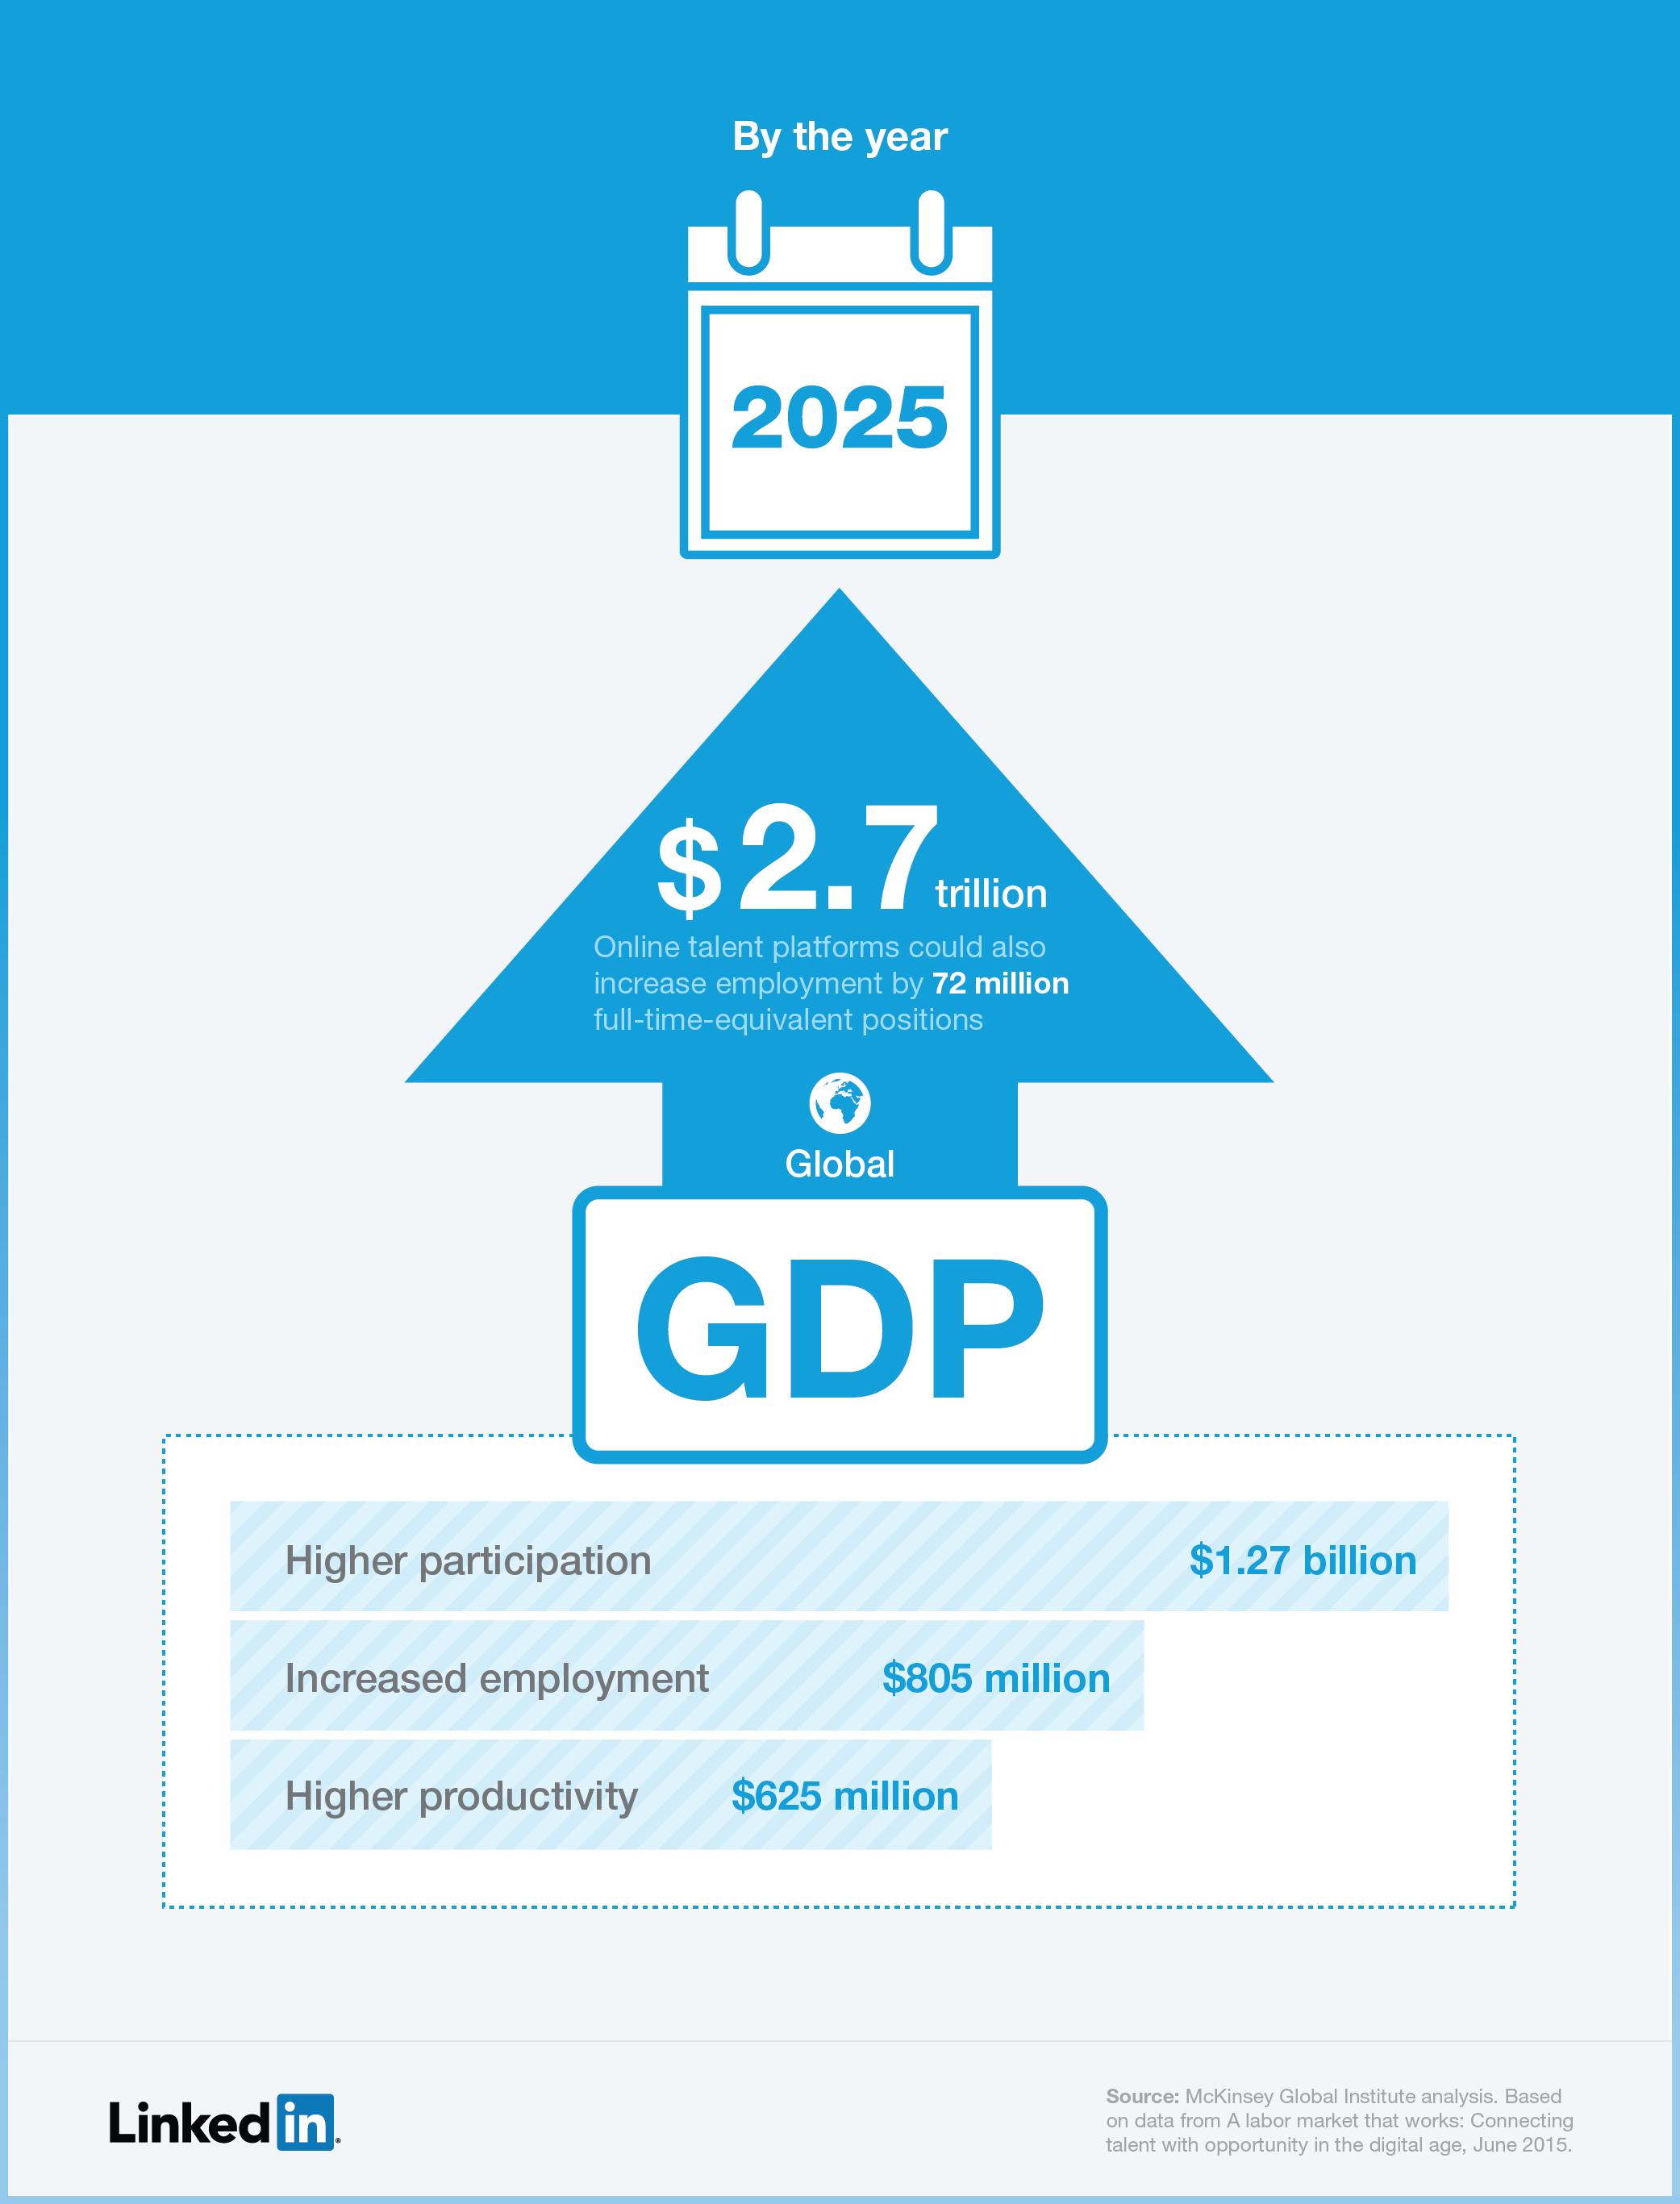 Online Talent Platforms 2.7 trillion infographic